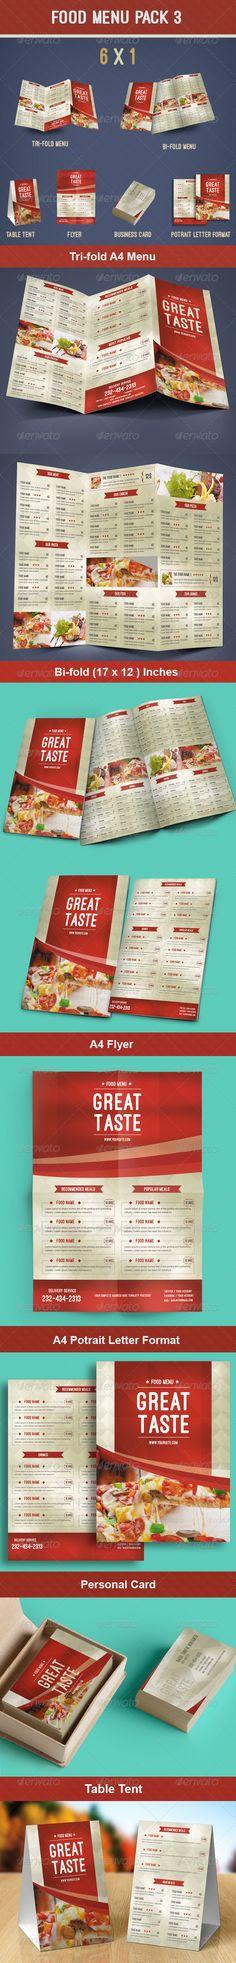 Food Menu Pack Template #design Download: http://graphicriver.net/item/food-menu-pack-3/8565596?ref=ksioks